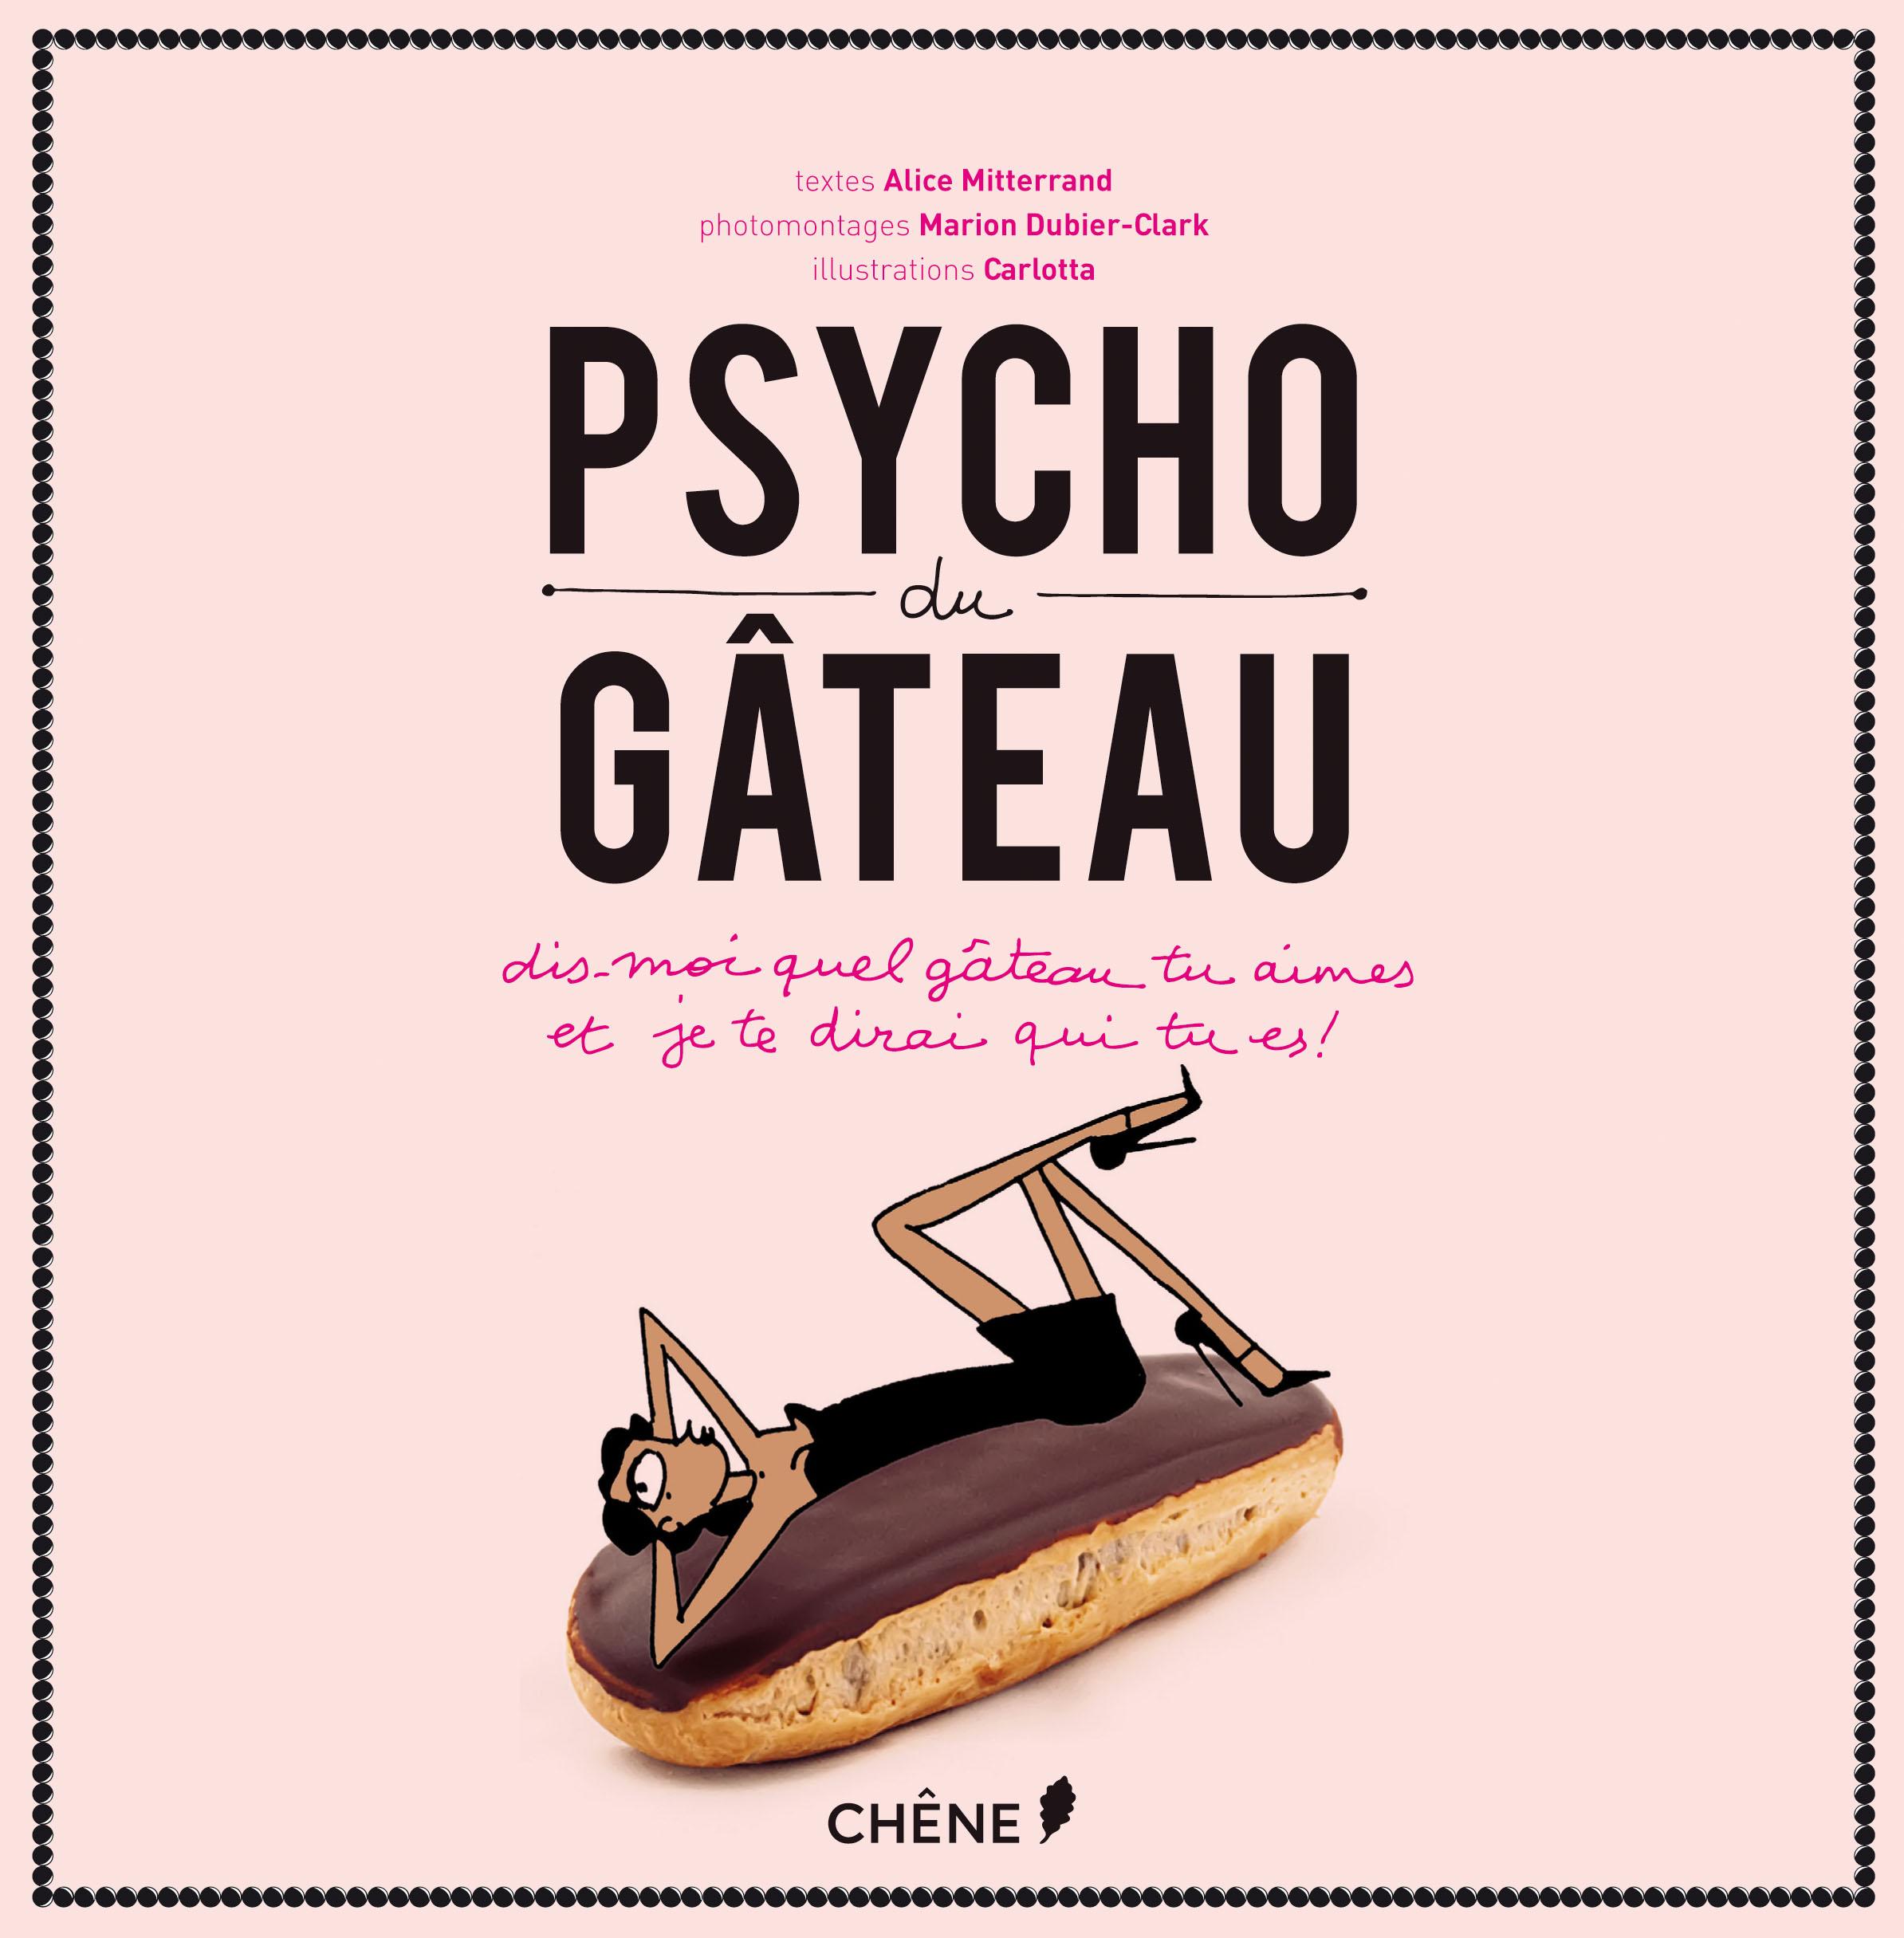 2013-09-24-PsychoGateau_300dpi_RVB.jpg